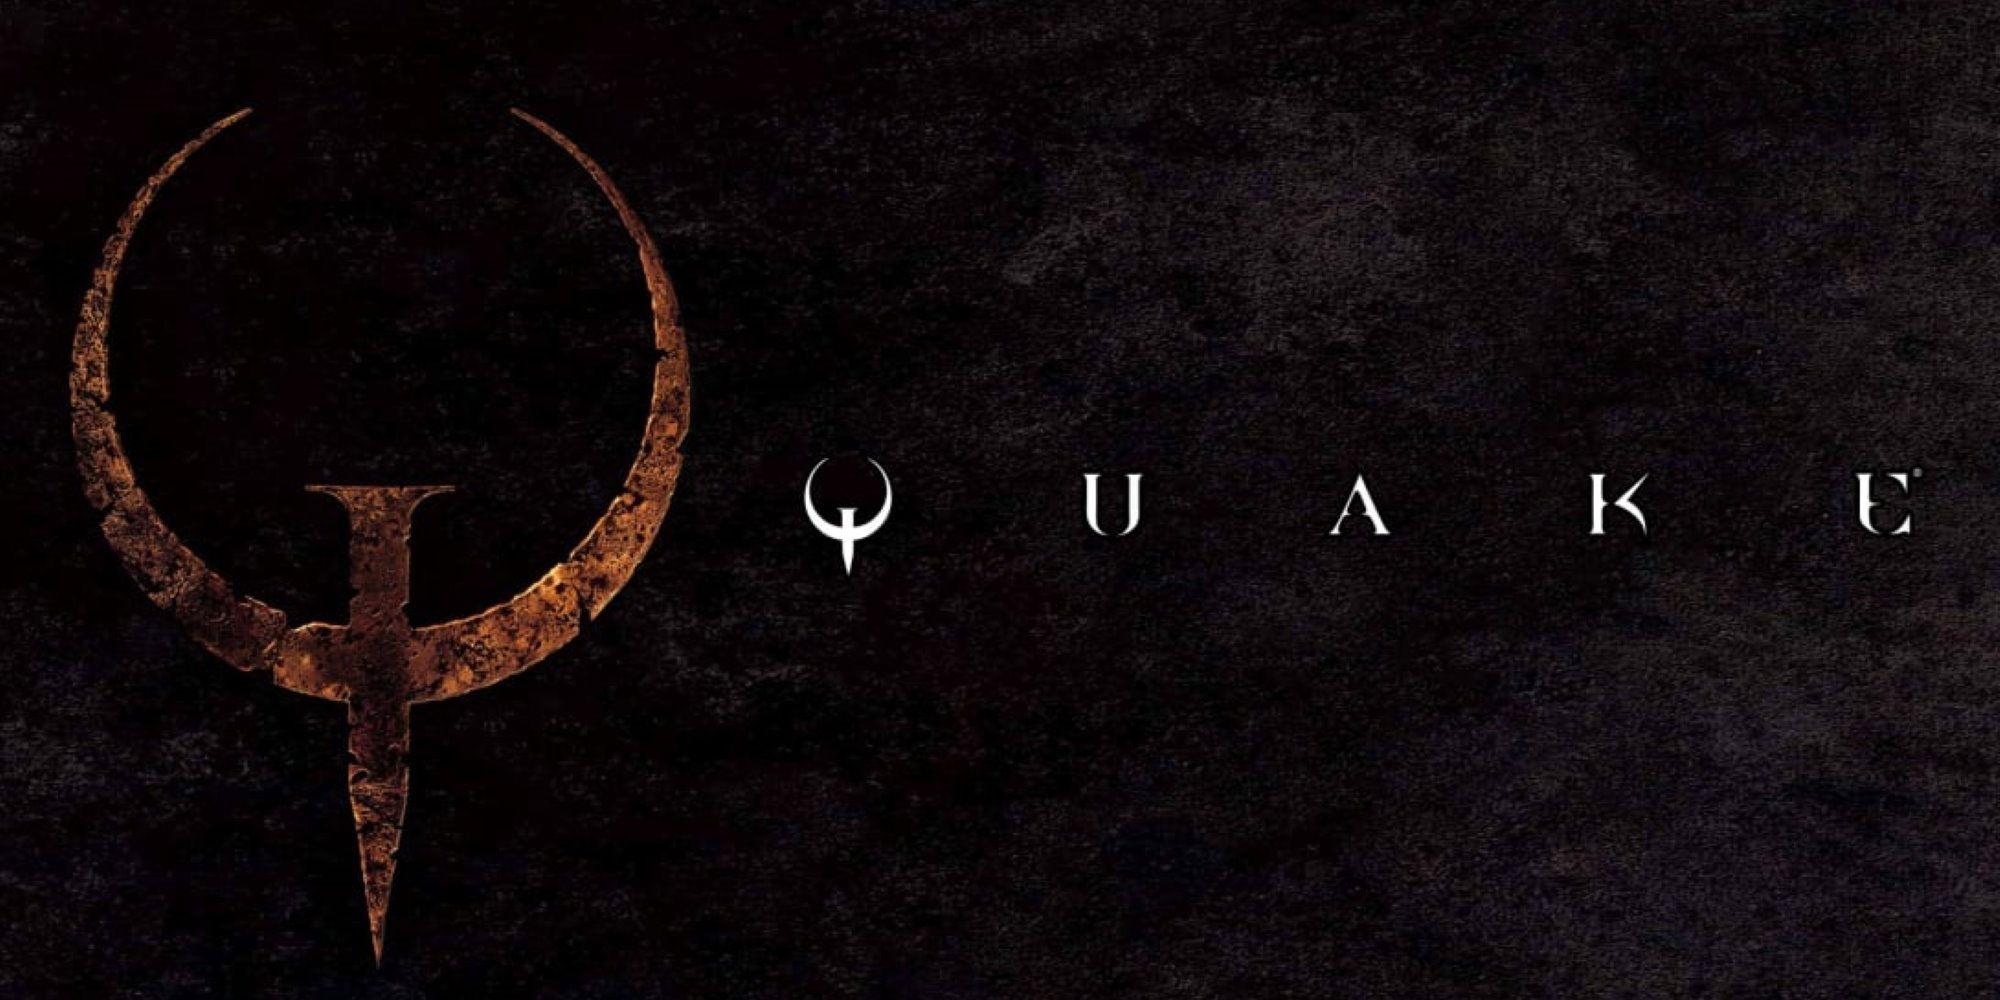 Quake Remastered: Lista de trucos y comandos de consola